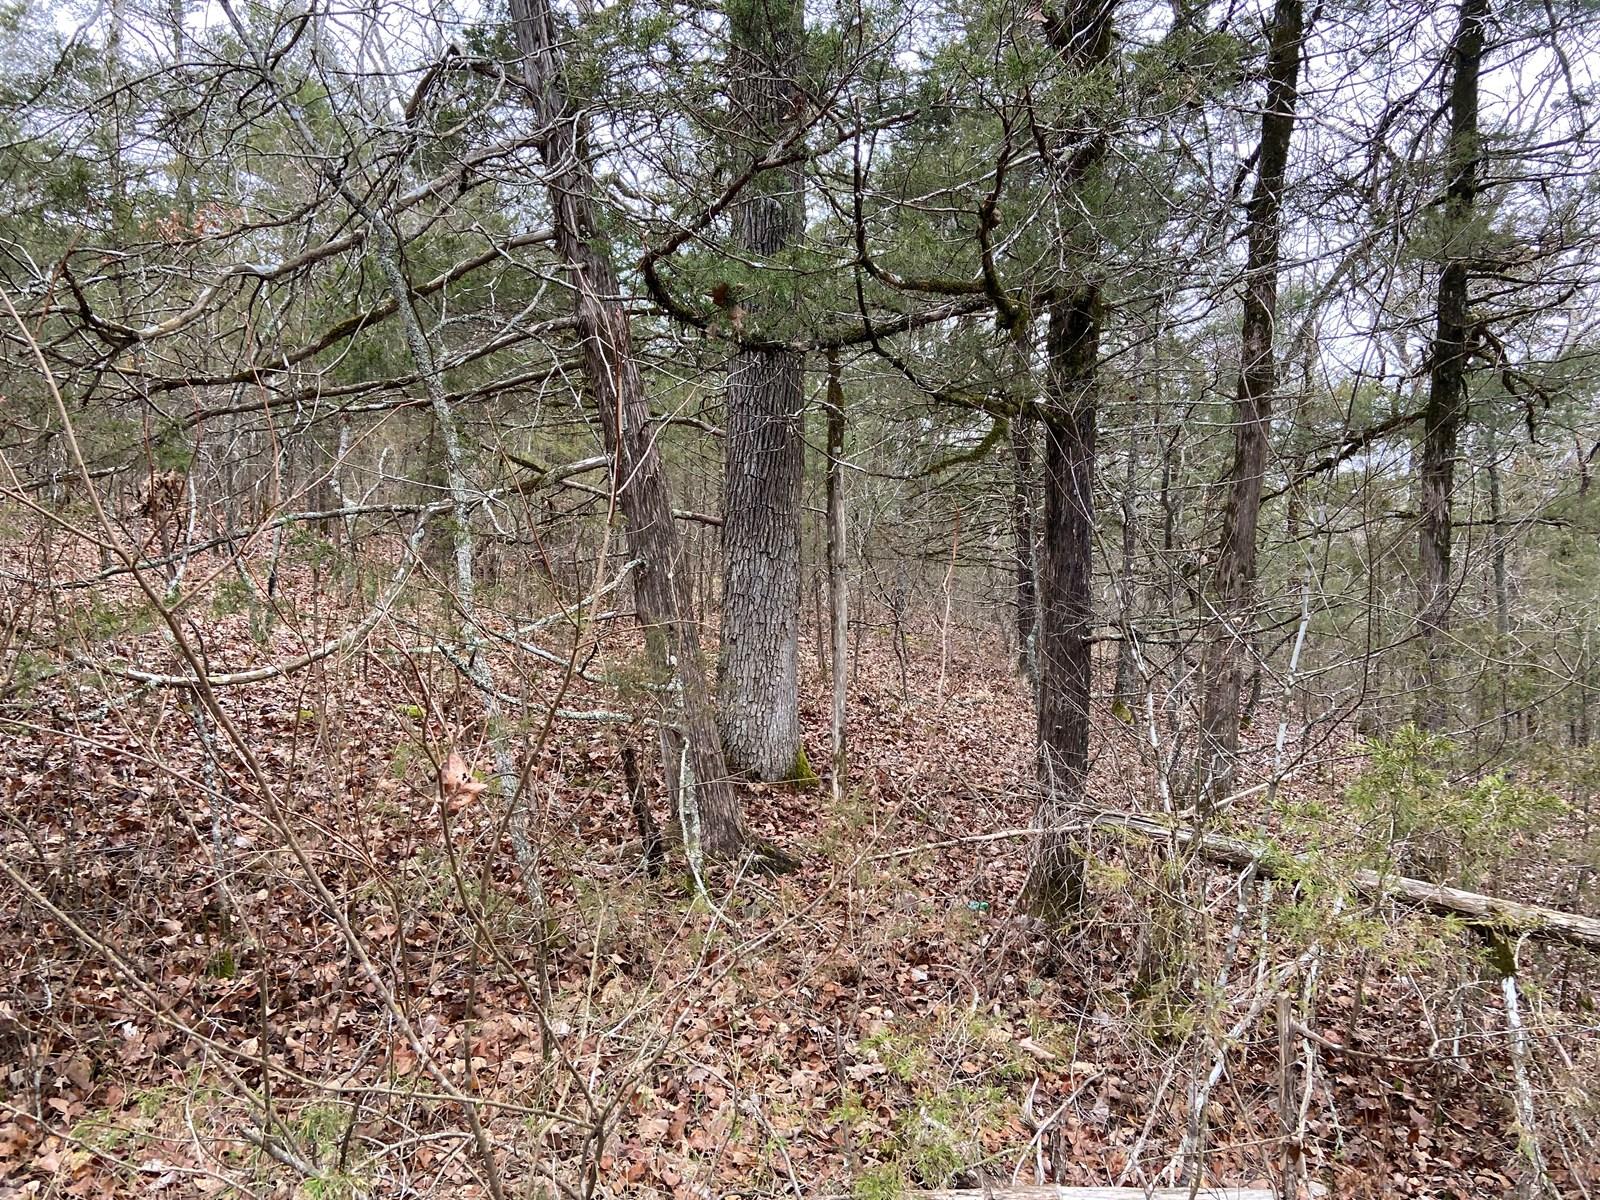 Land in Arkansas for sale, Deer woods, Hunting land in AR